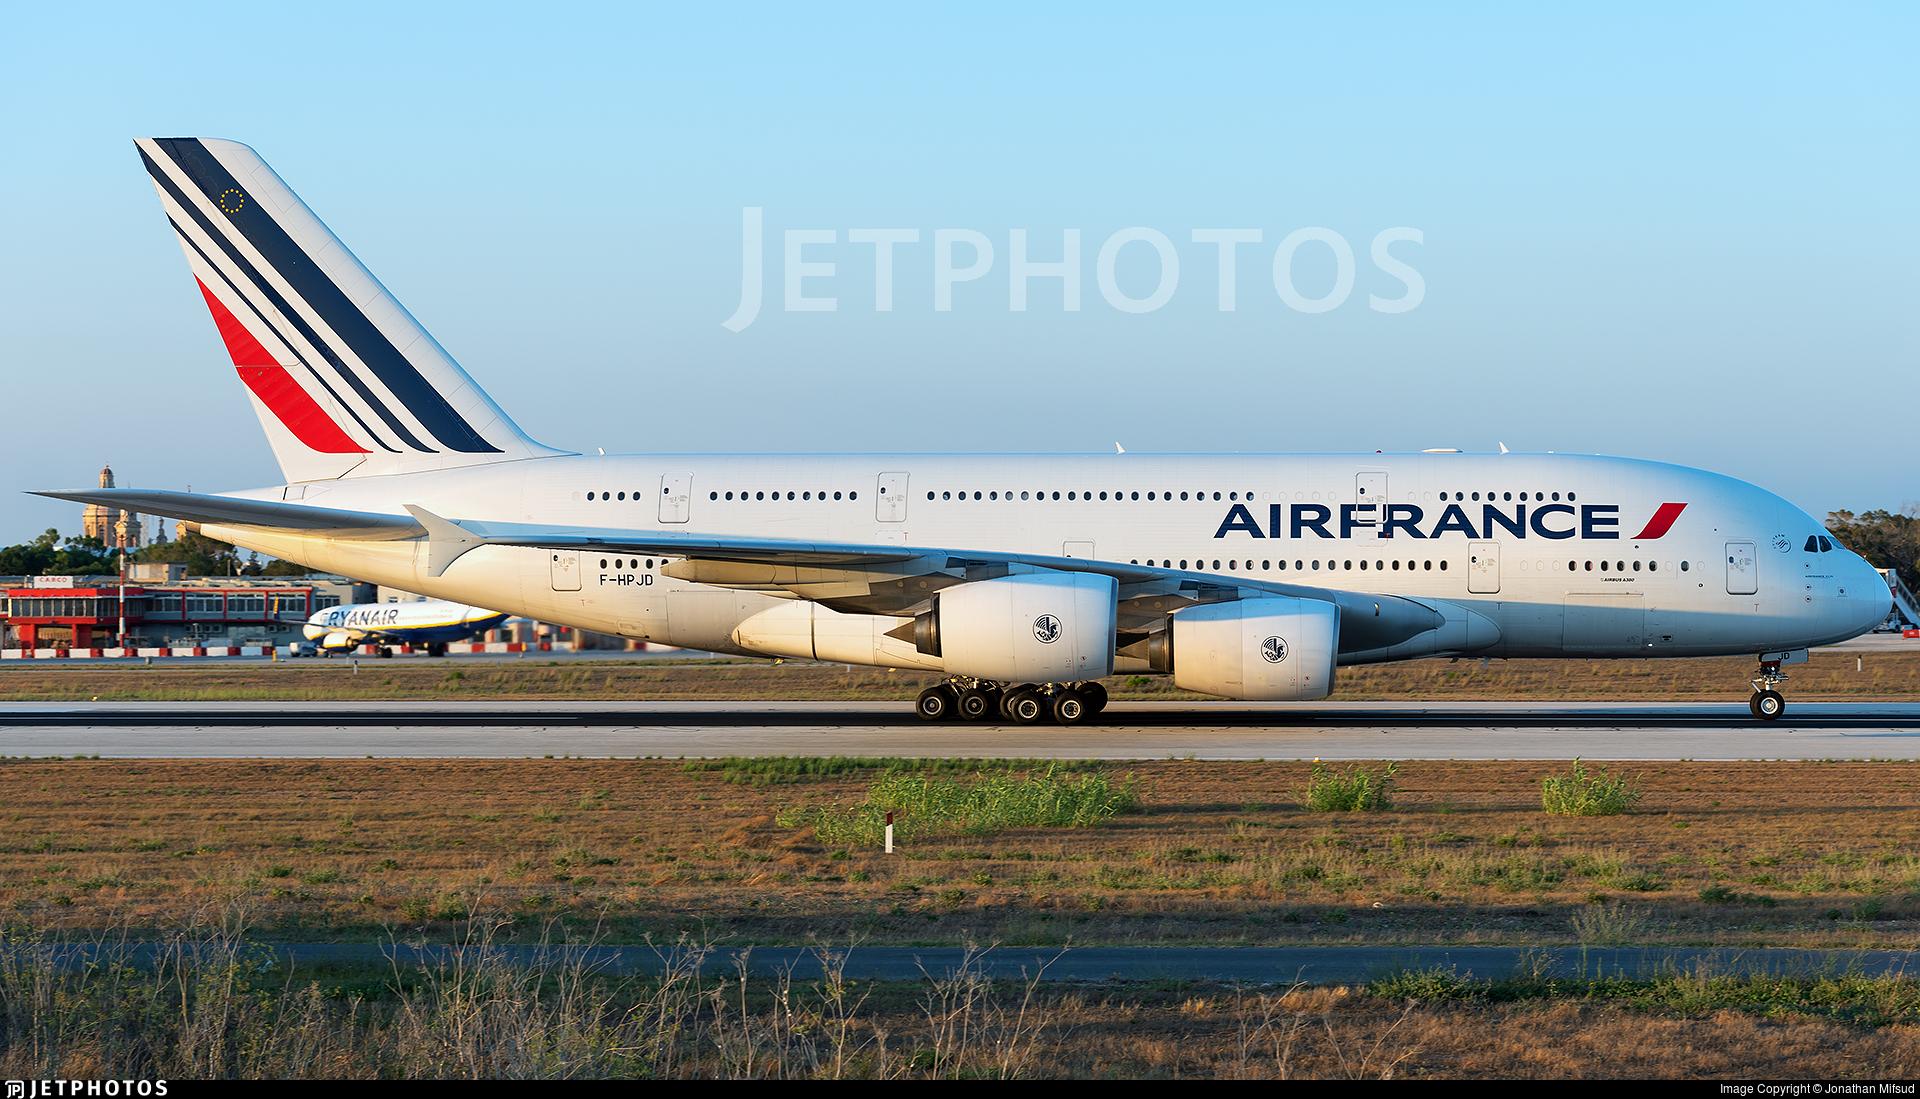 F-HPJD - Airbus A380-861 - Air France